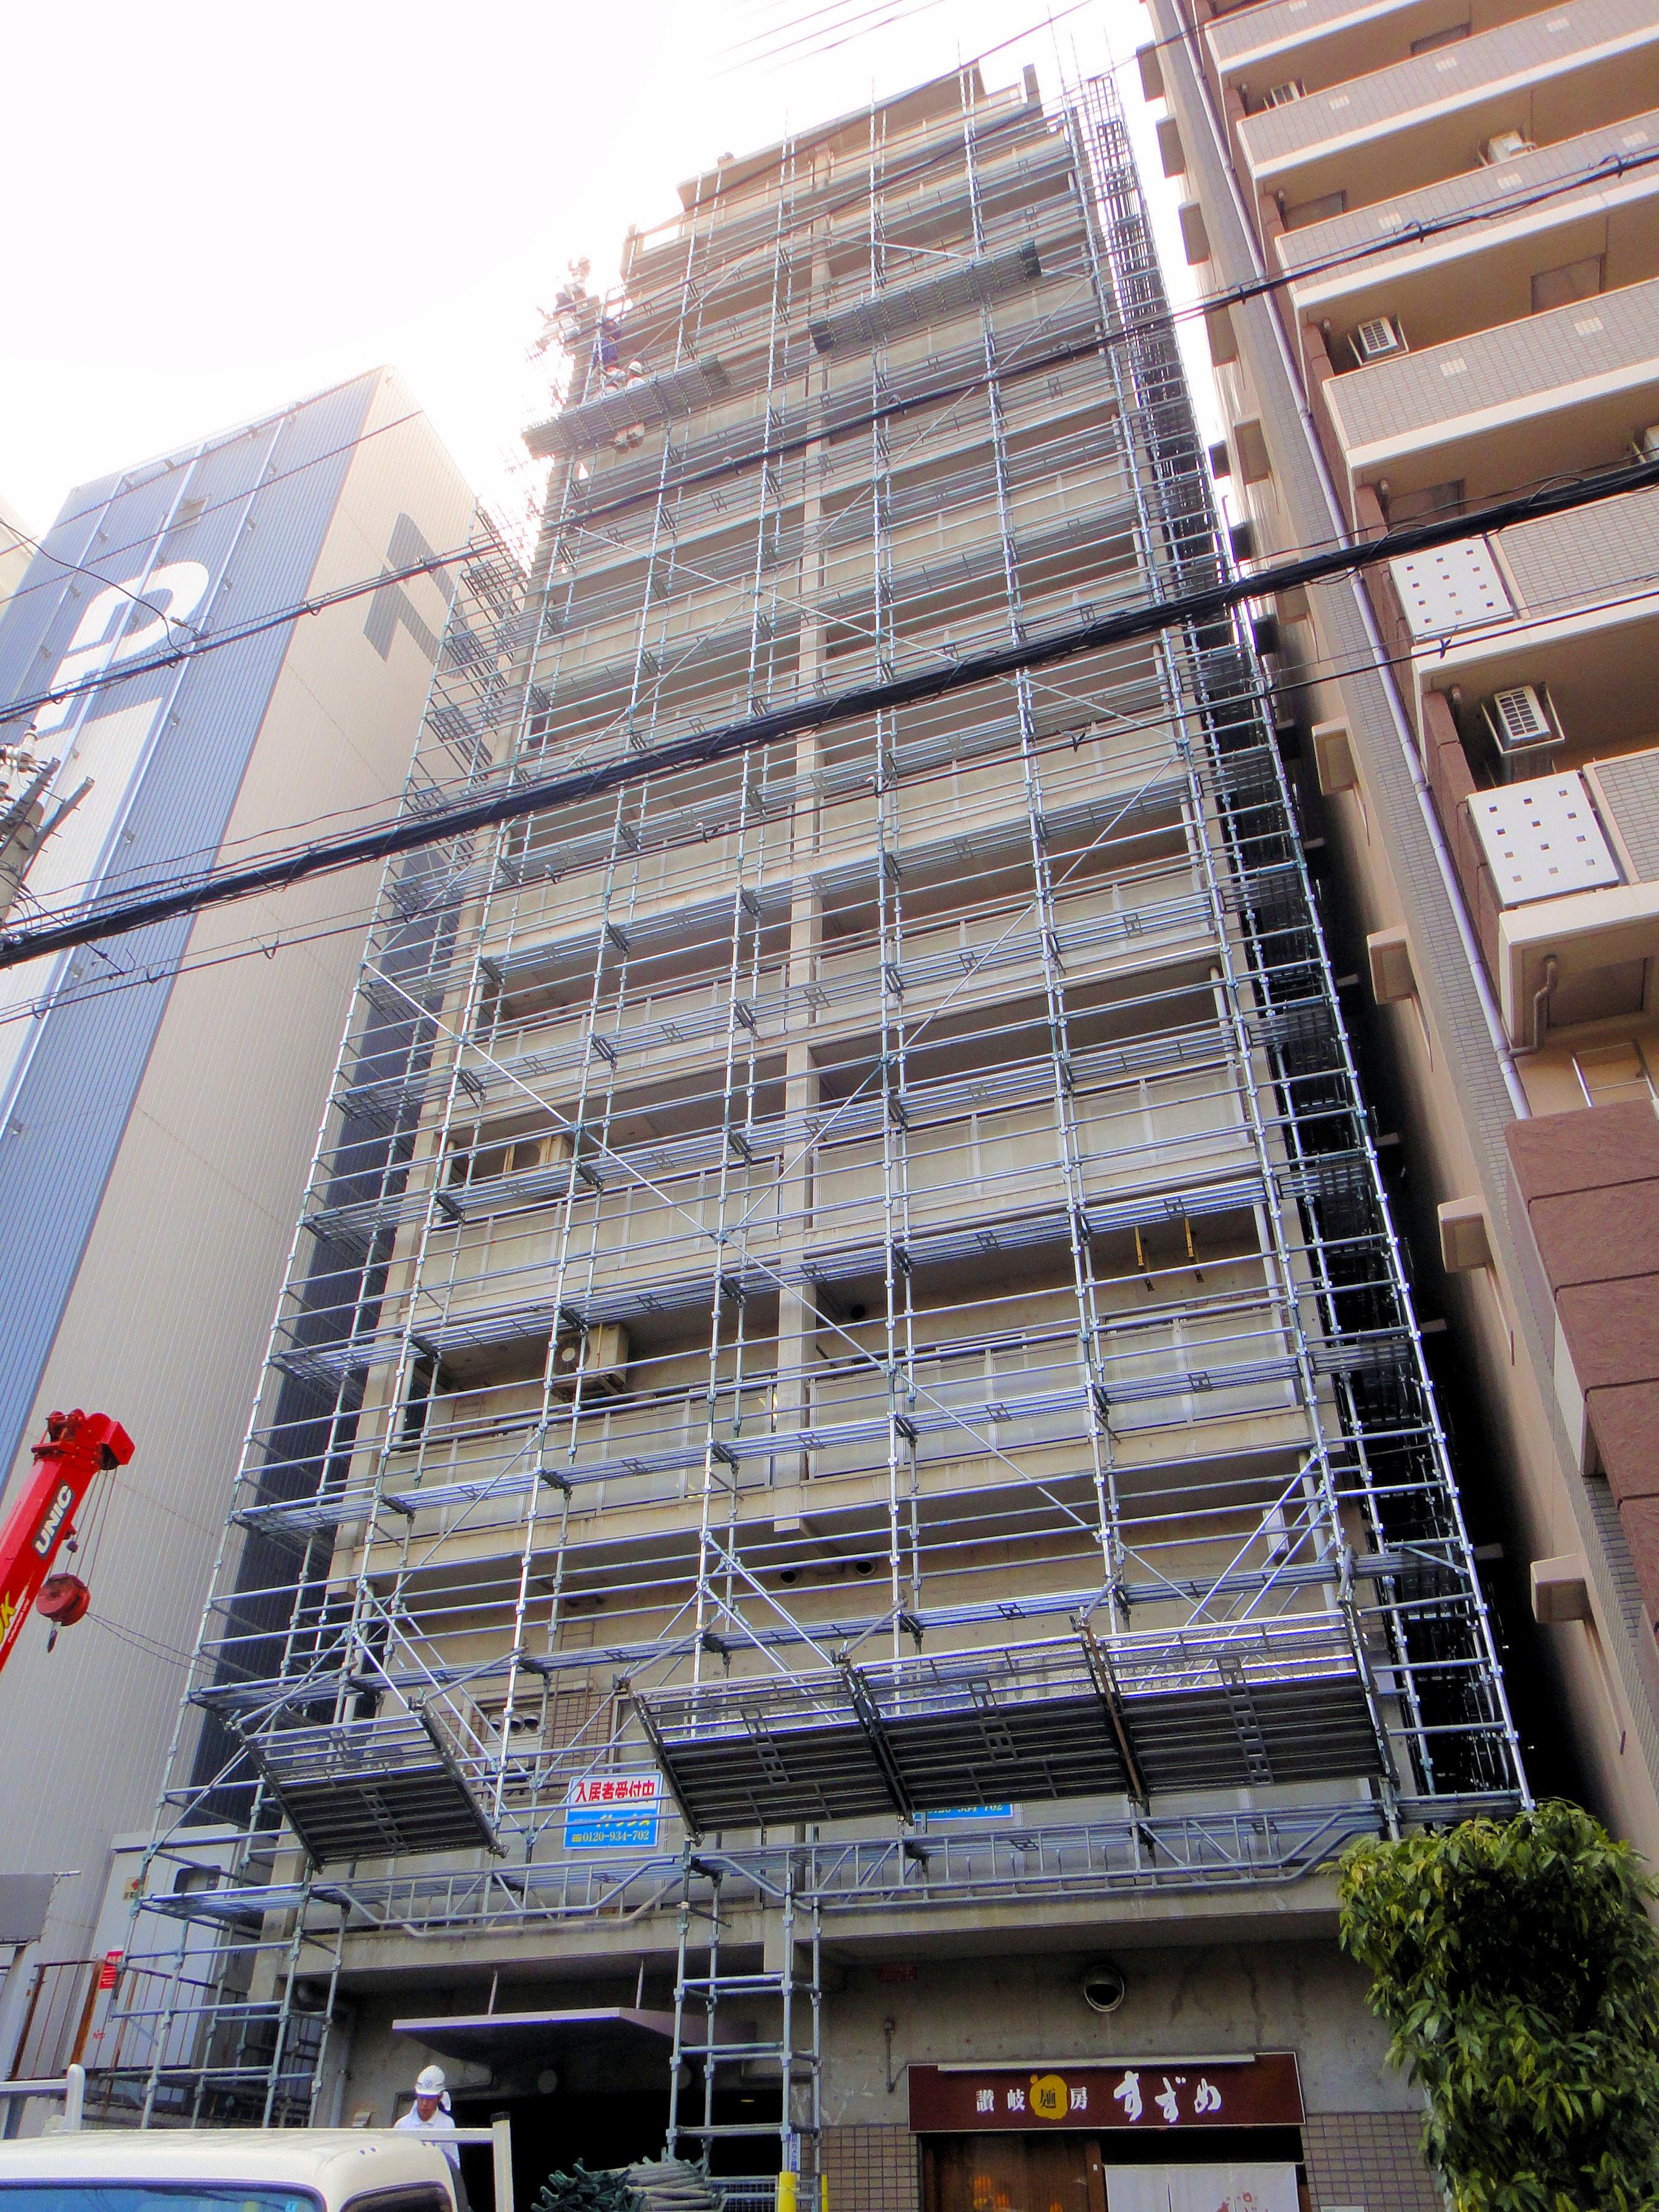 アスティ三ノ宮大規模修繕工事(兵庫県神戸市)